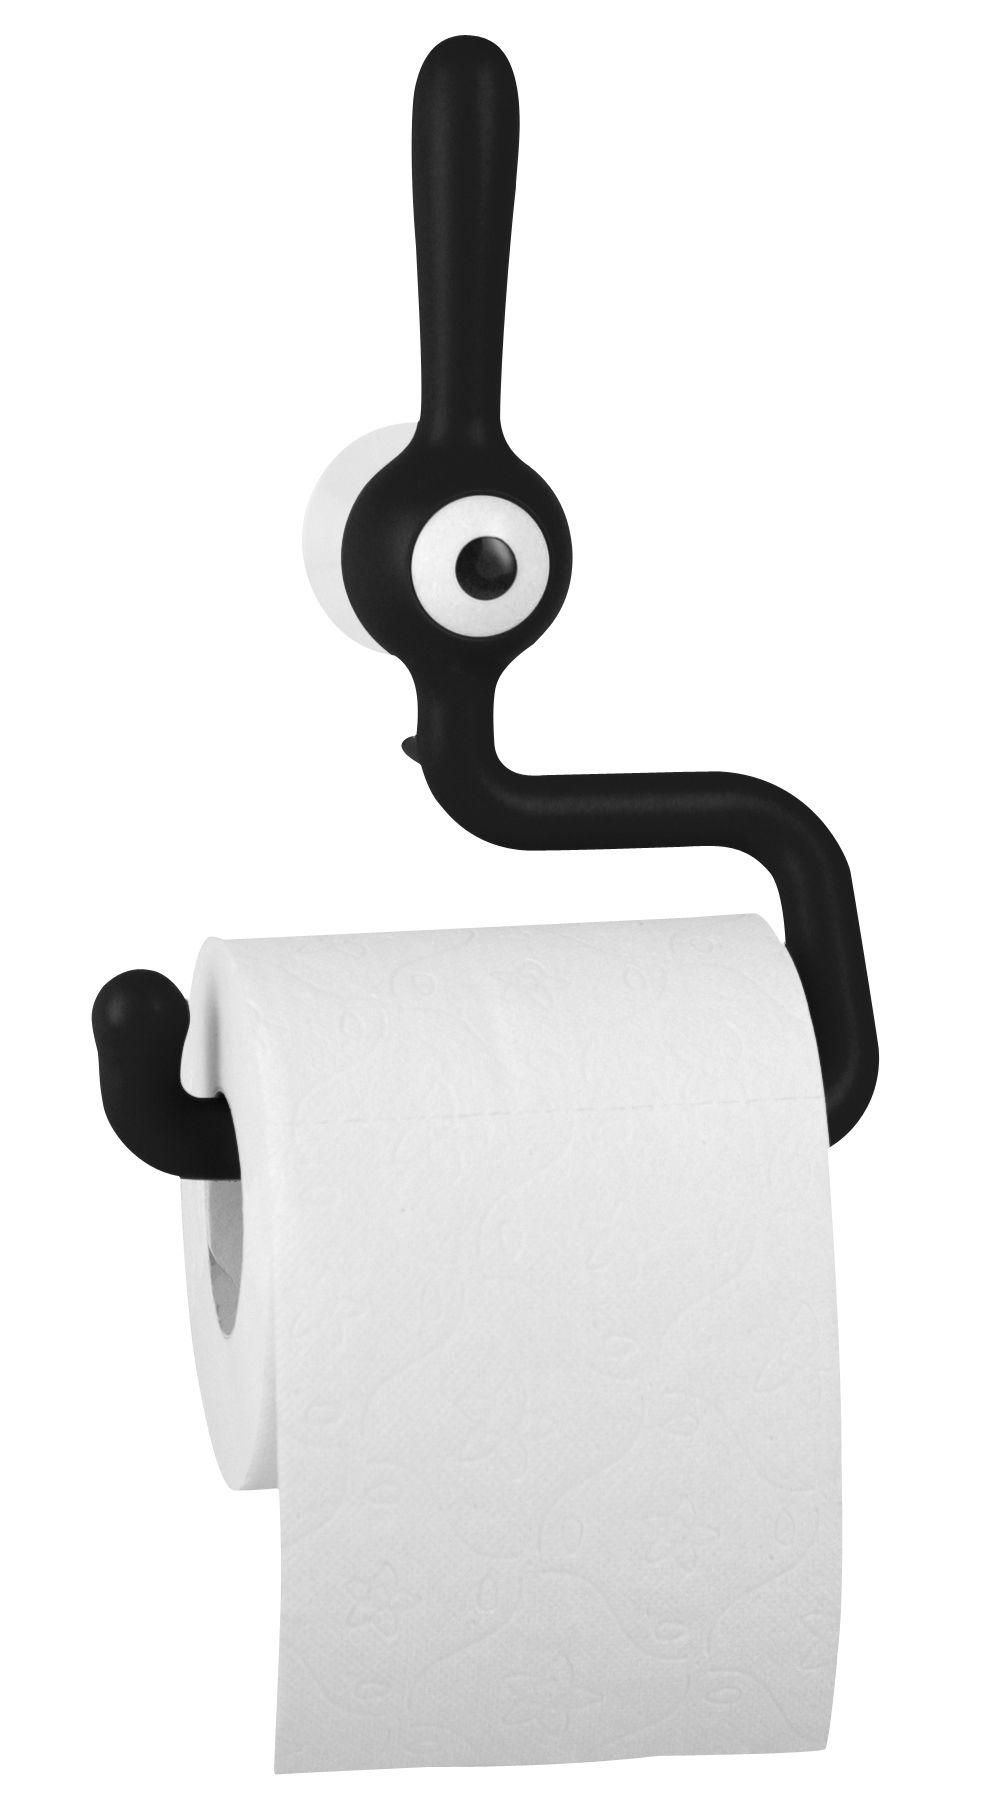 Decoration - For bathroom - Toq Toilet paper dispenser by Koziol - Black - Polypropylene